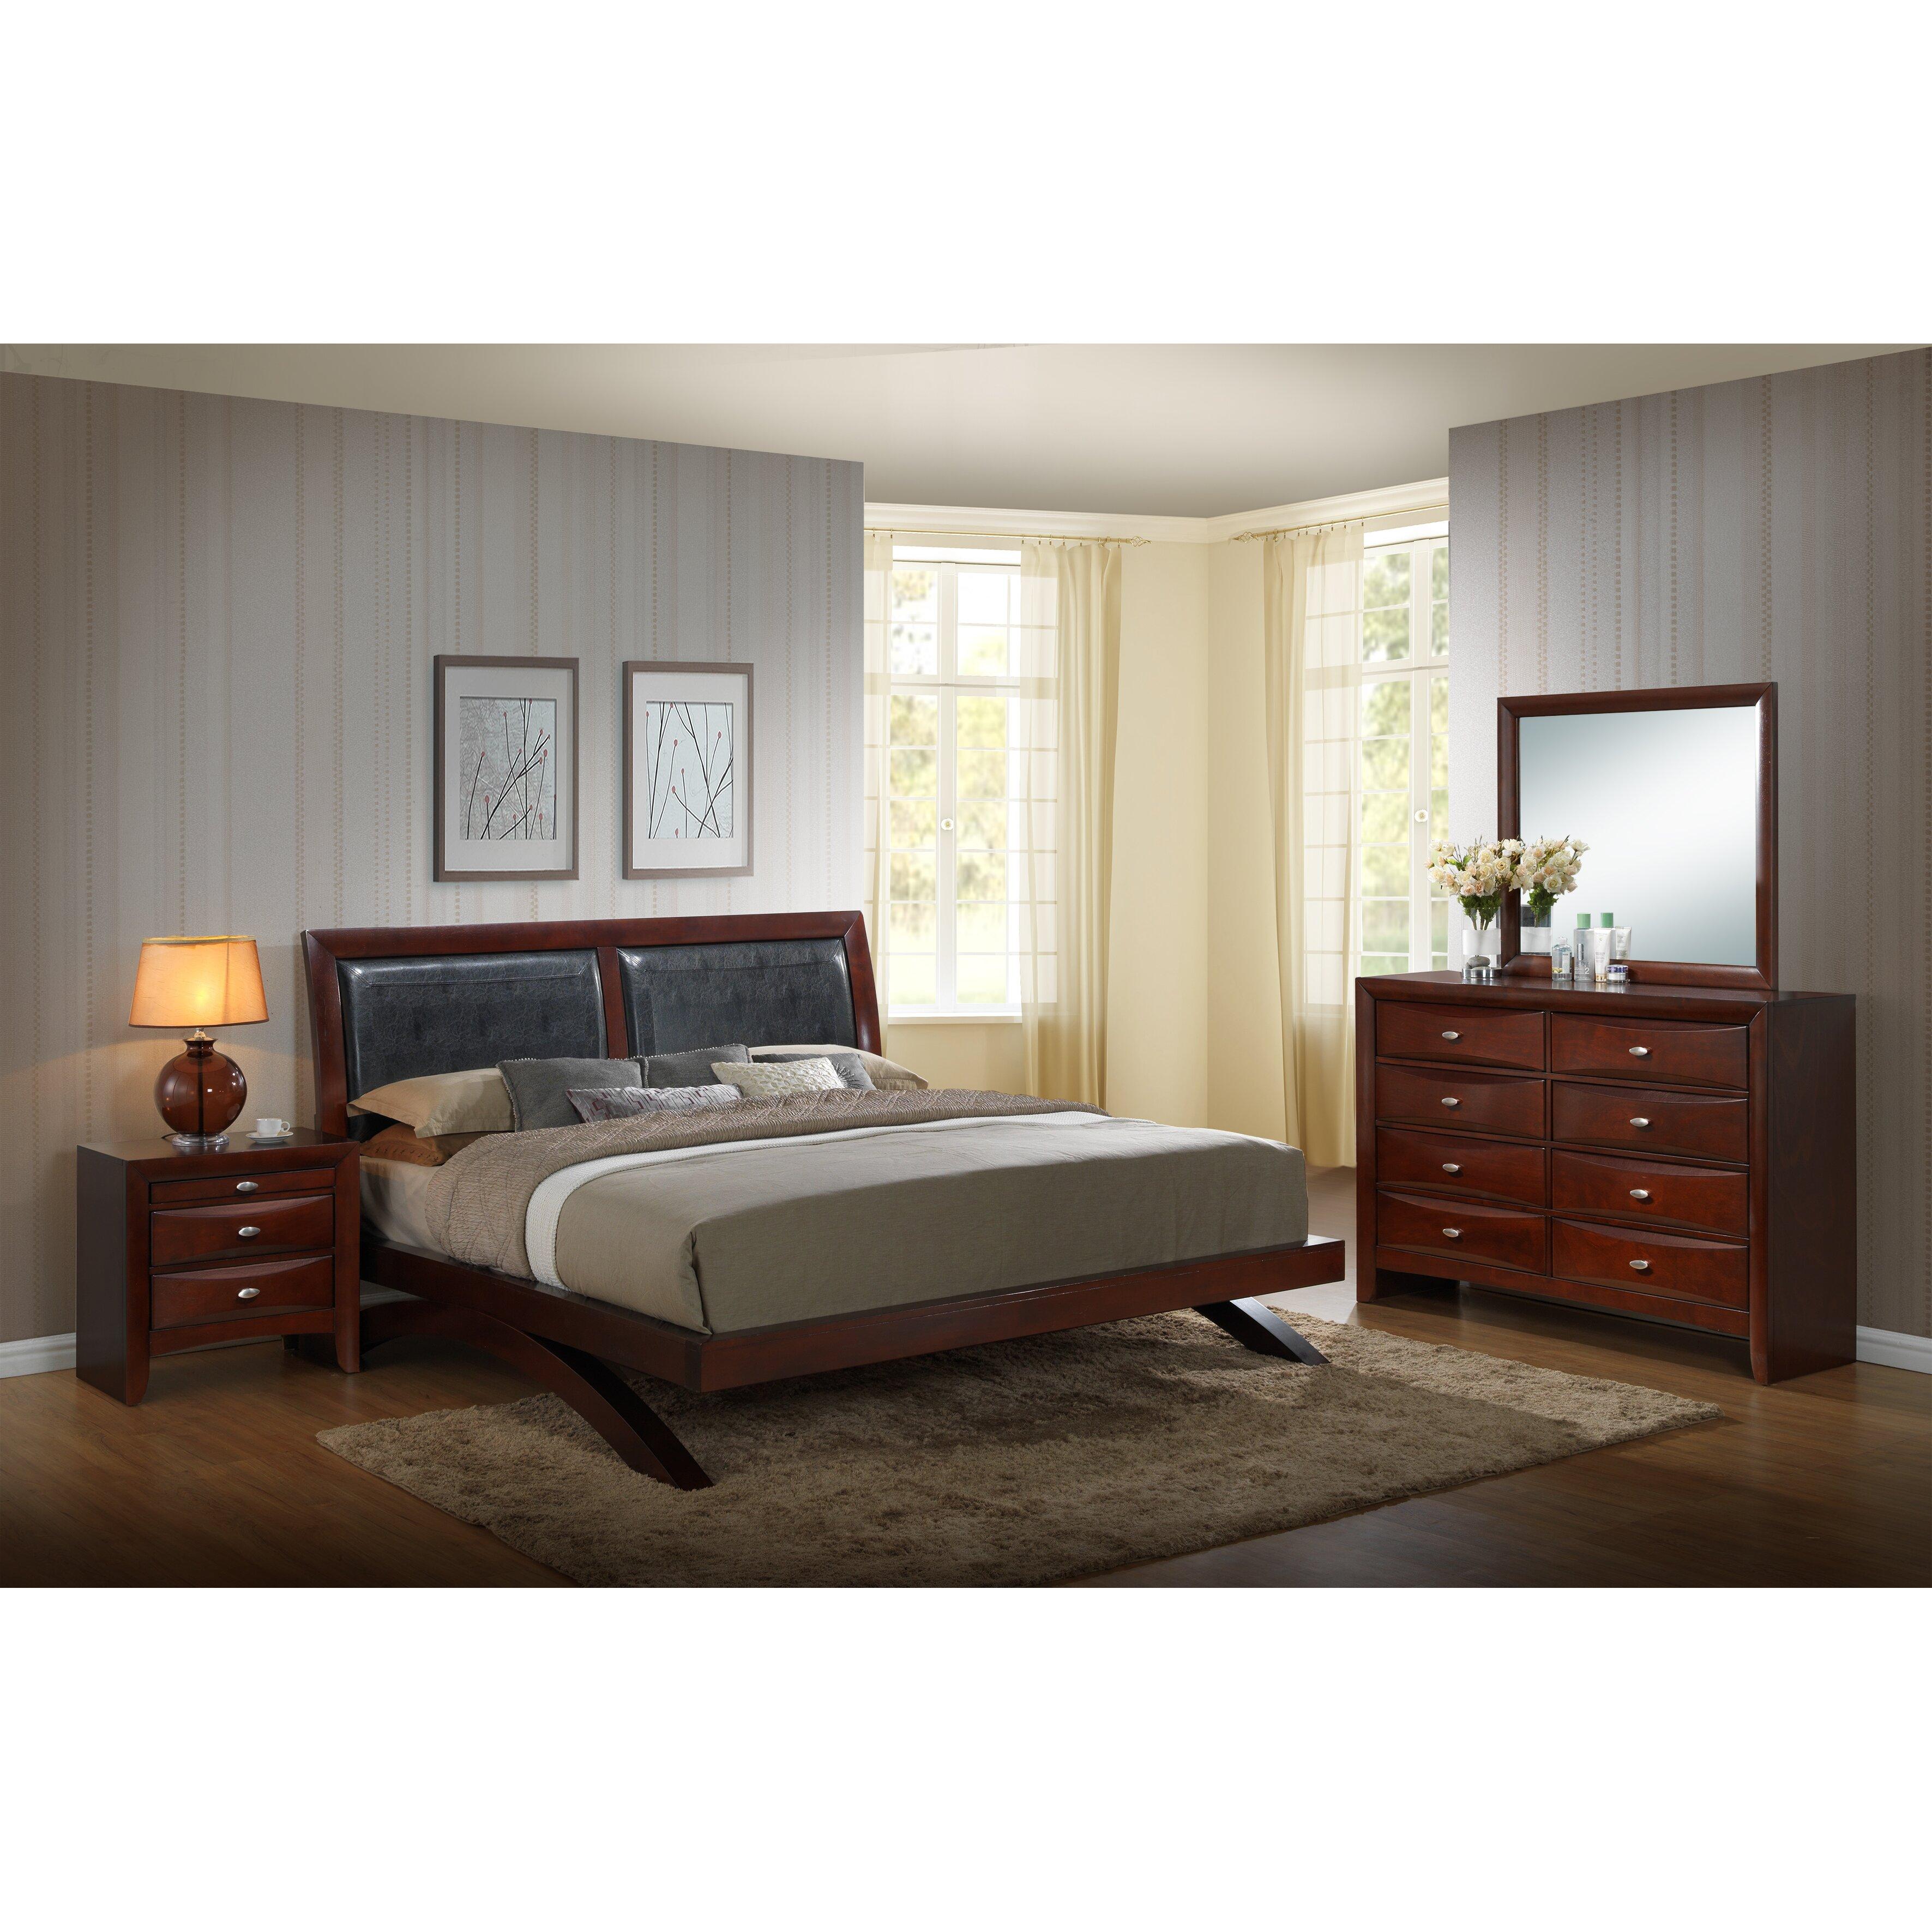 Roundhill Furniture Emily Panel 4 Piece Bedroom Set